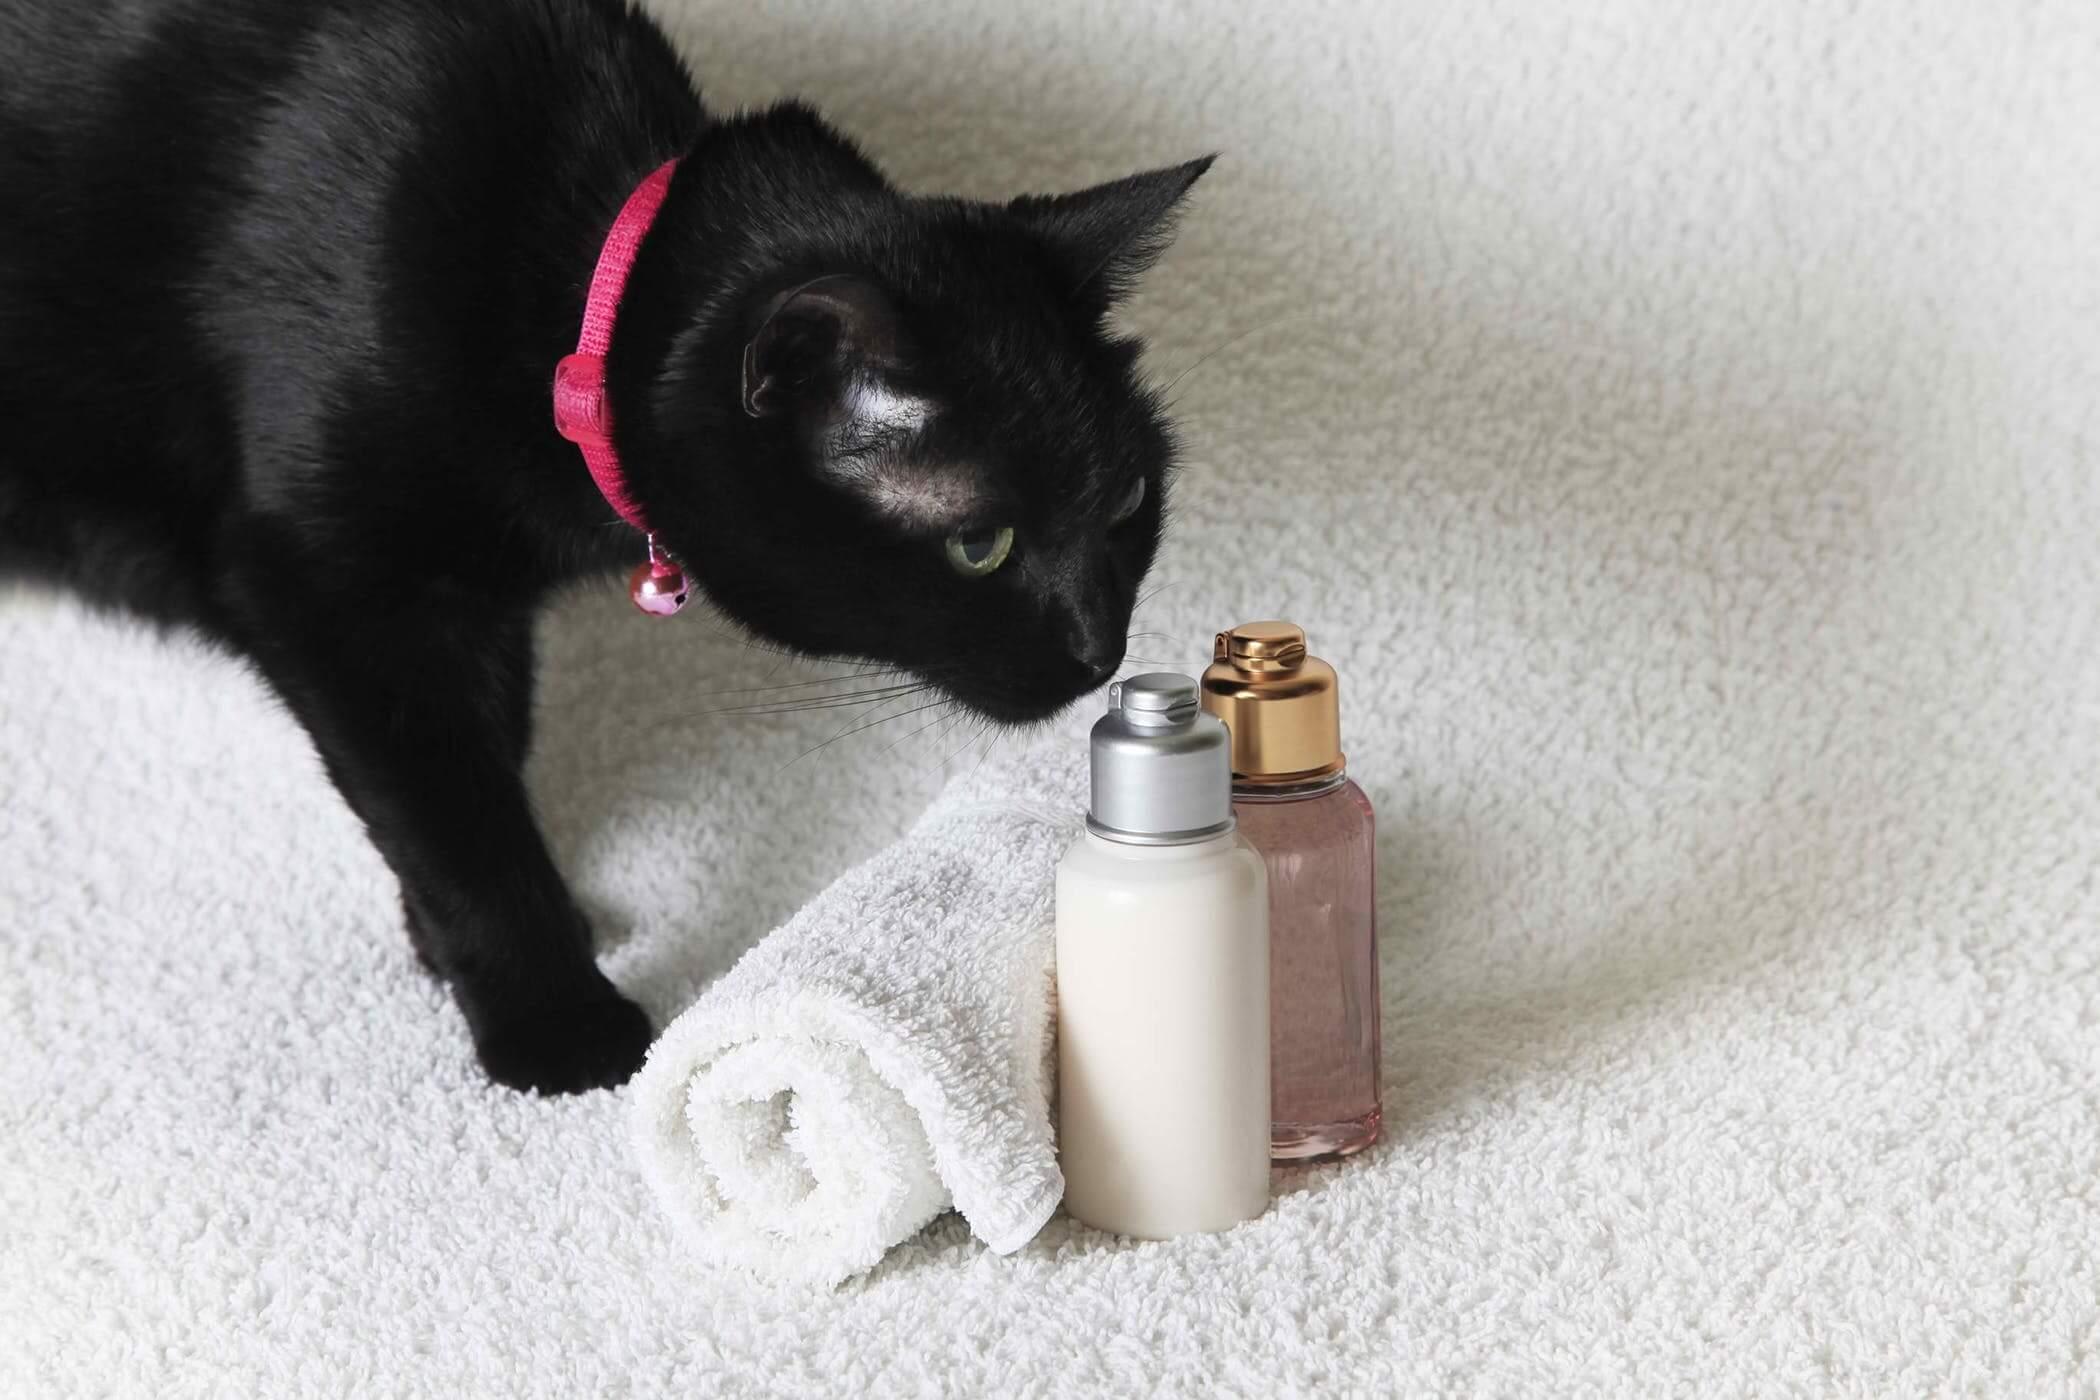 Rekomendasi Harga Shampo Kucing Terbaik